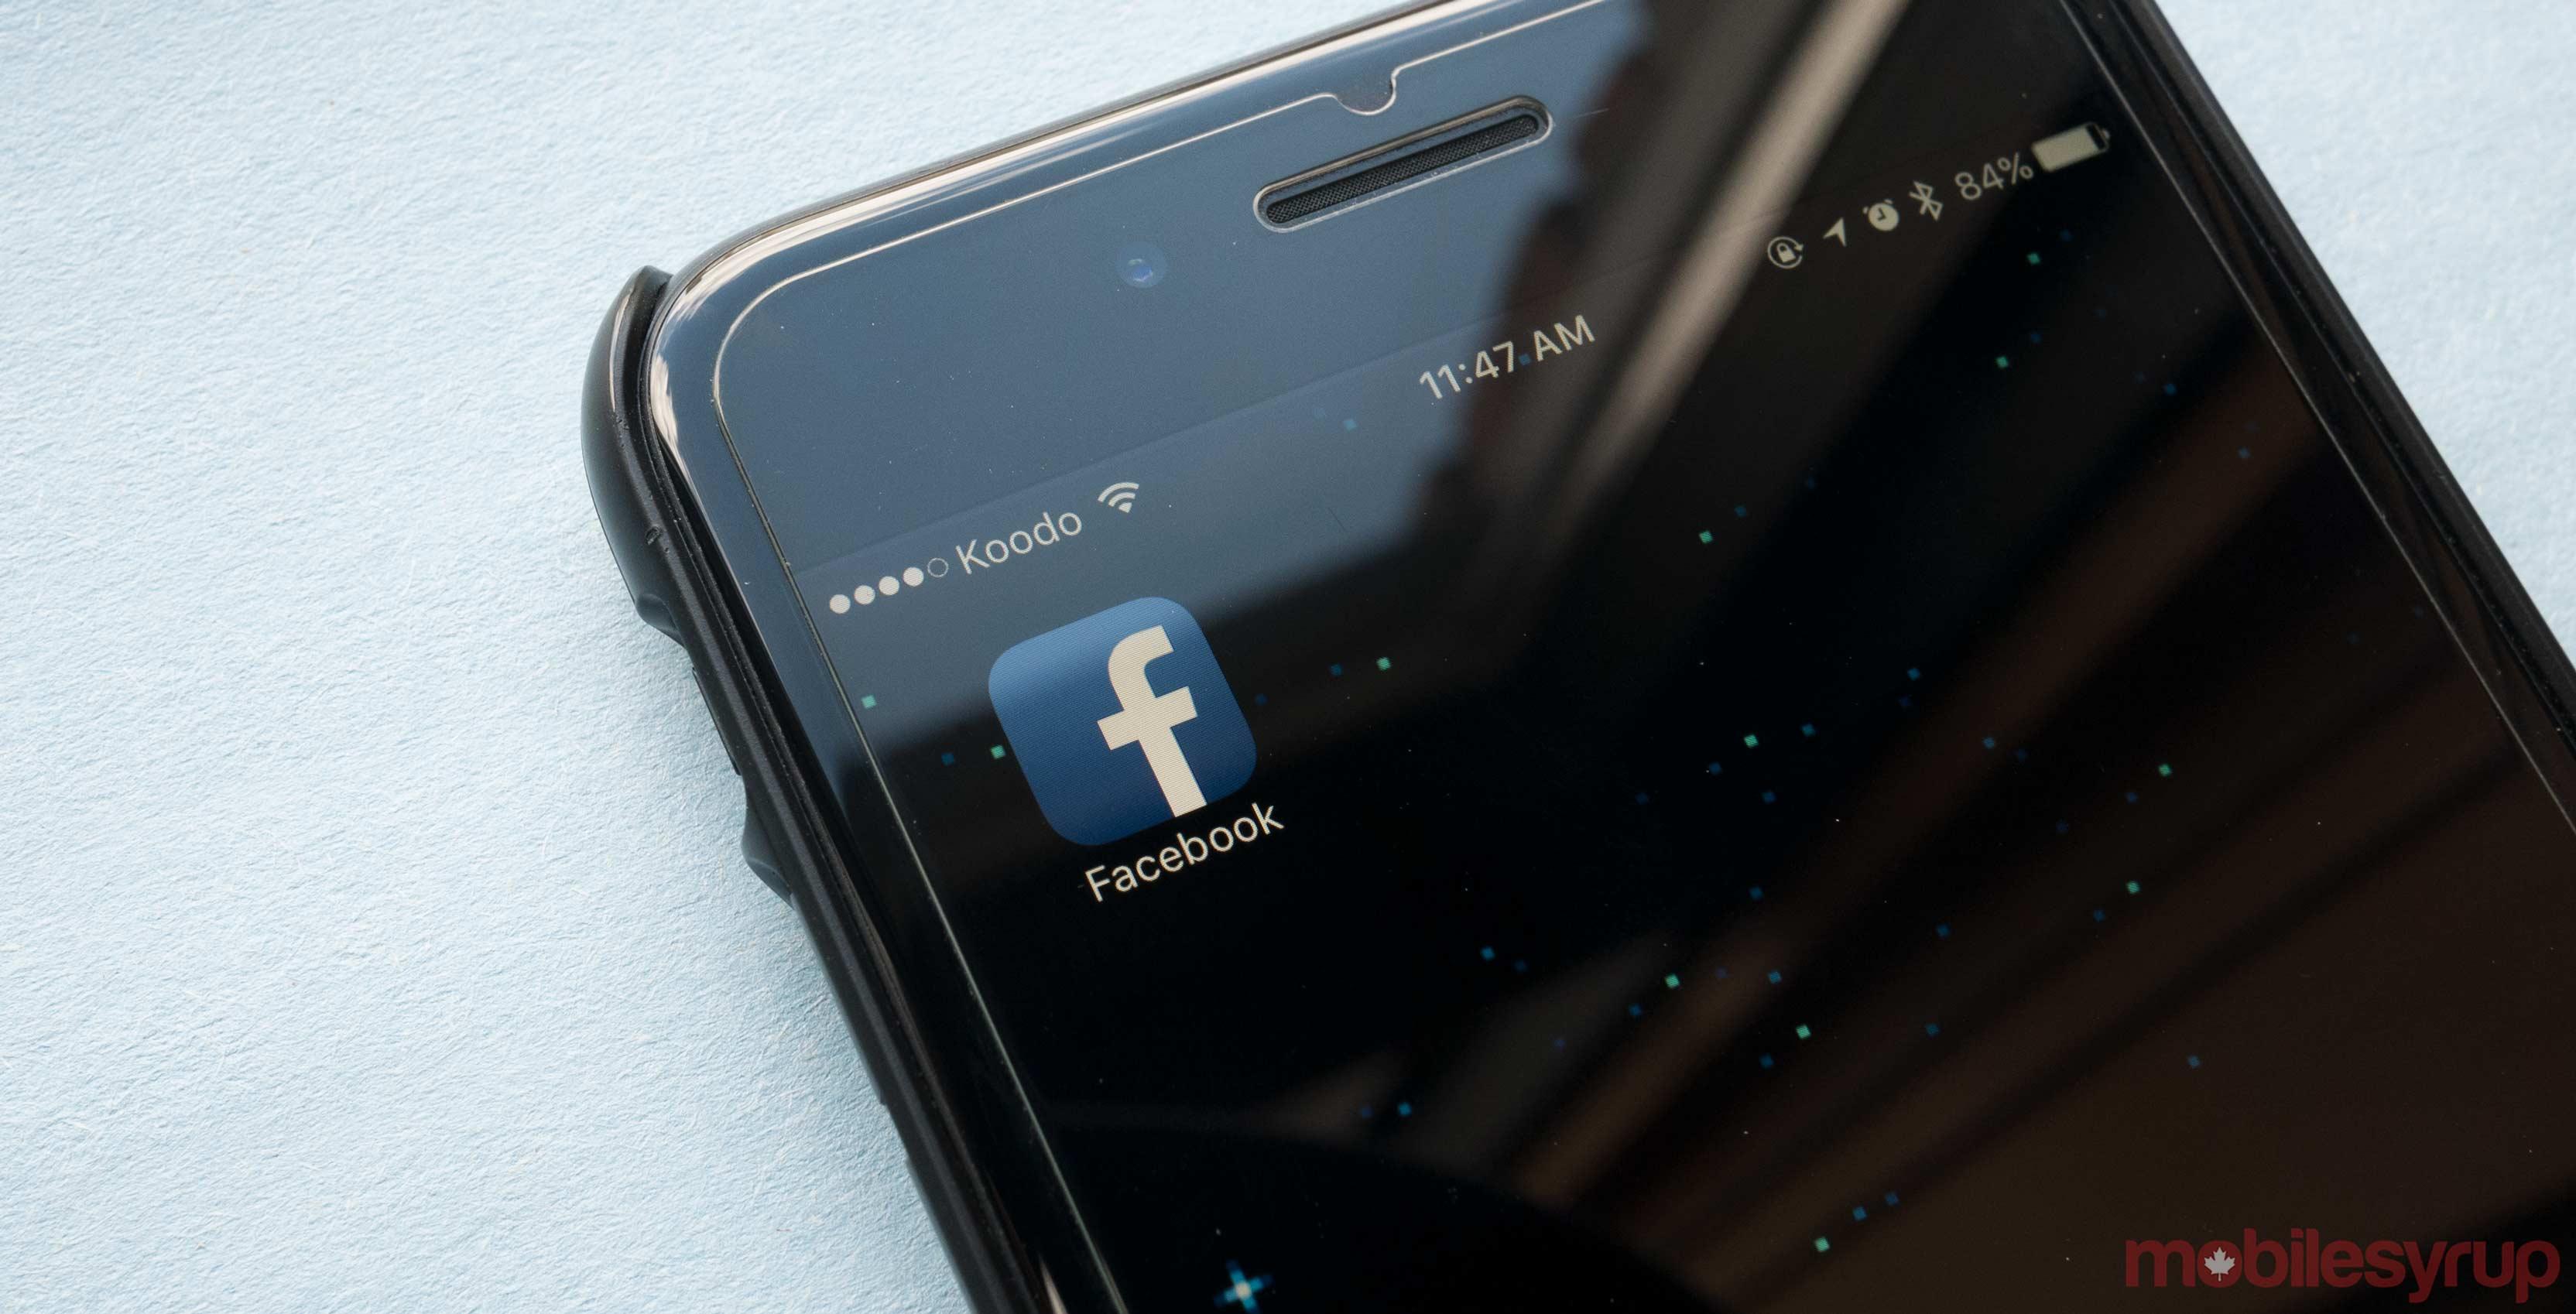 Facebook app on iPhone